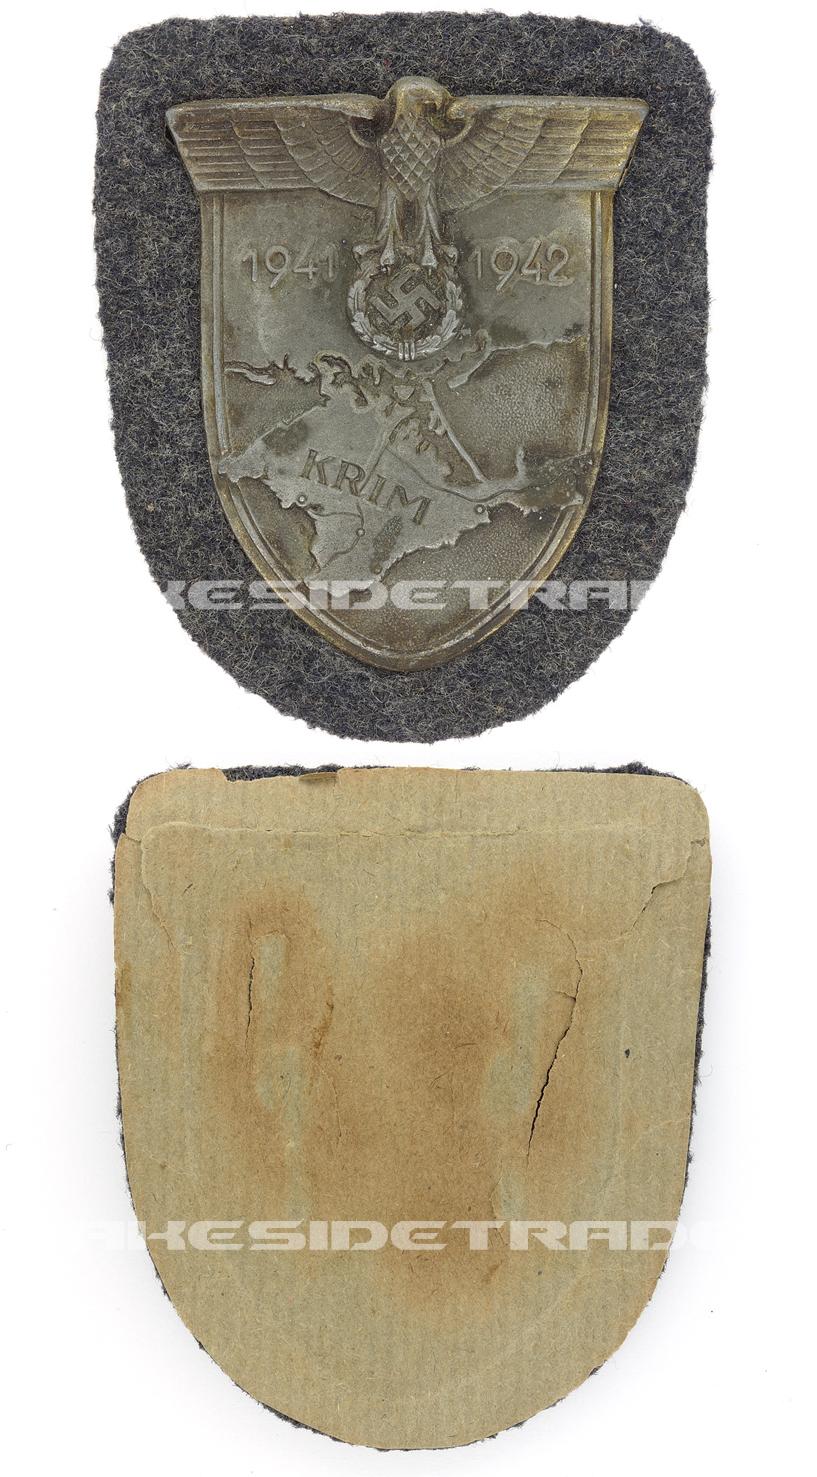 Luftwaffe Krim Campaign Arm Shield by W. Deumer